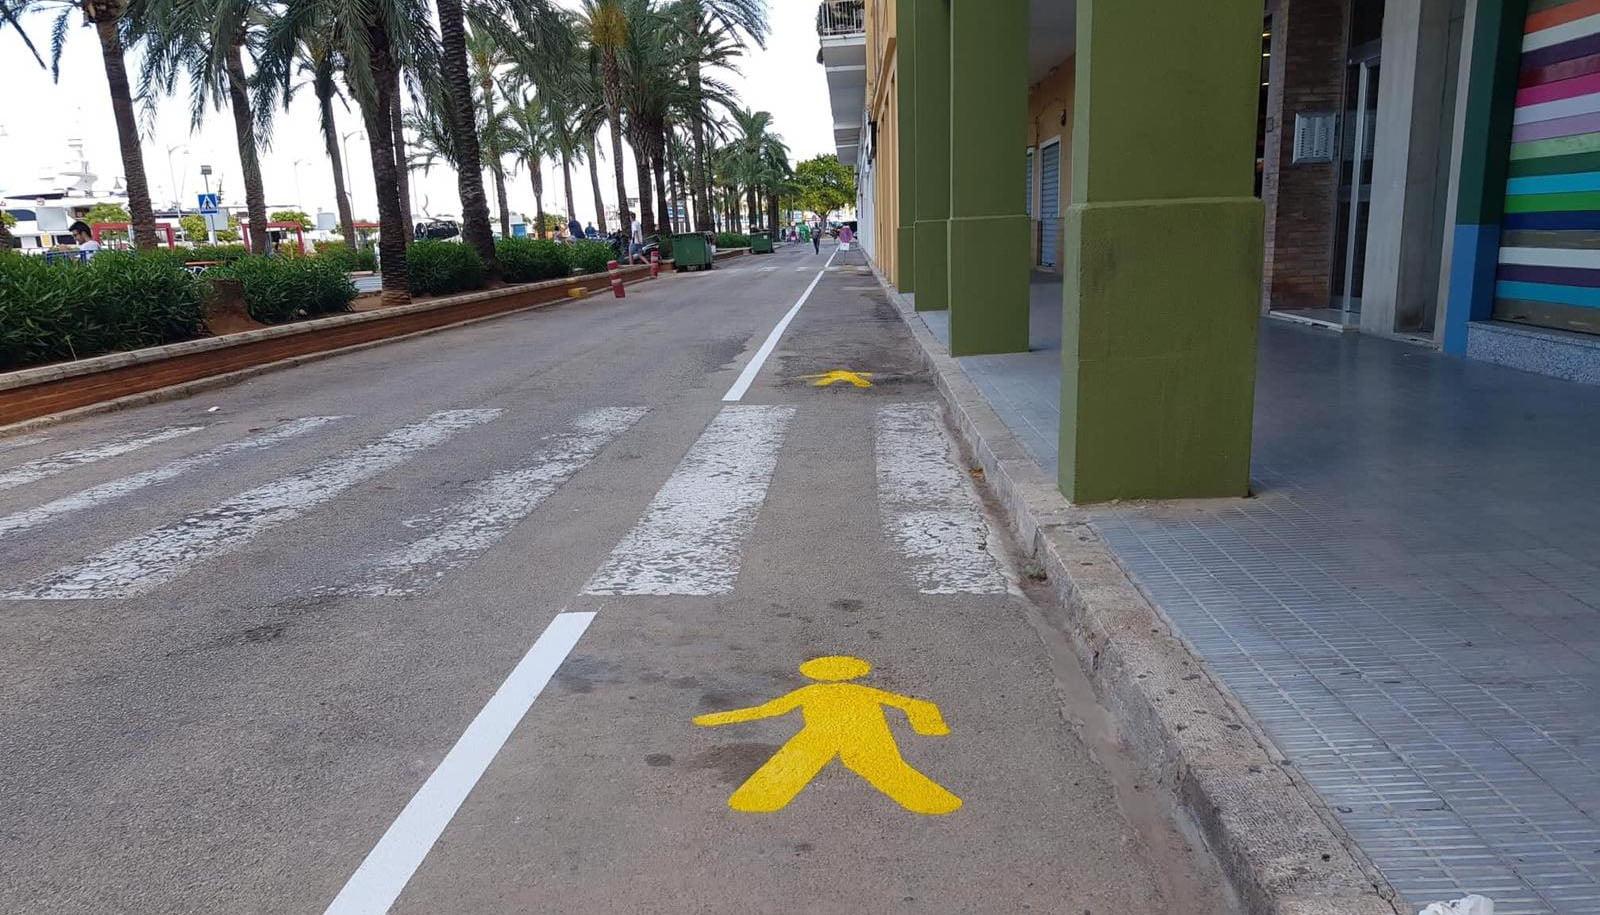 Expansion of the Explanada Cervantes pedestrian area